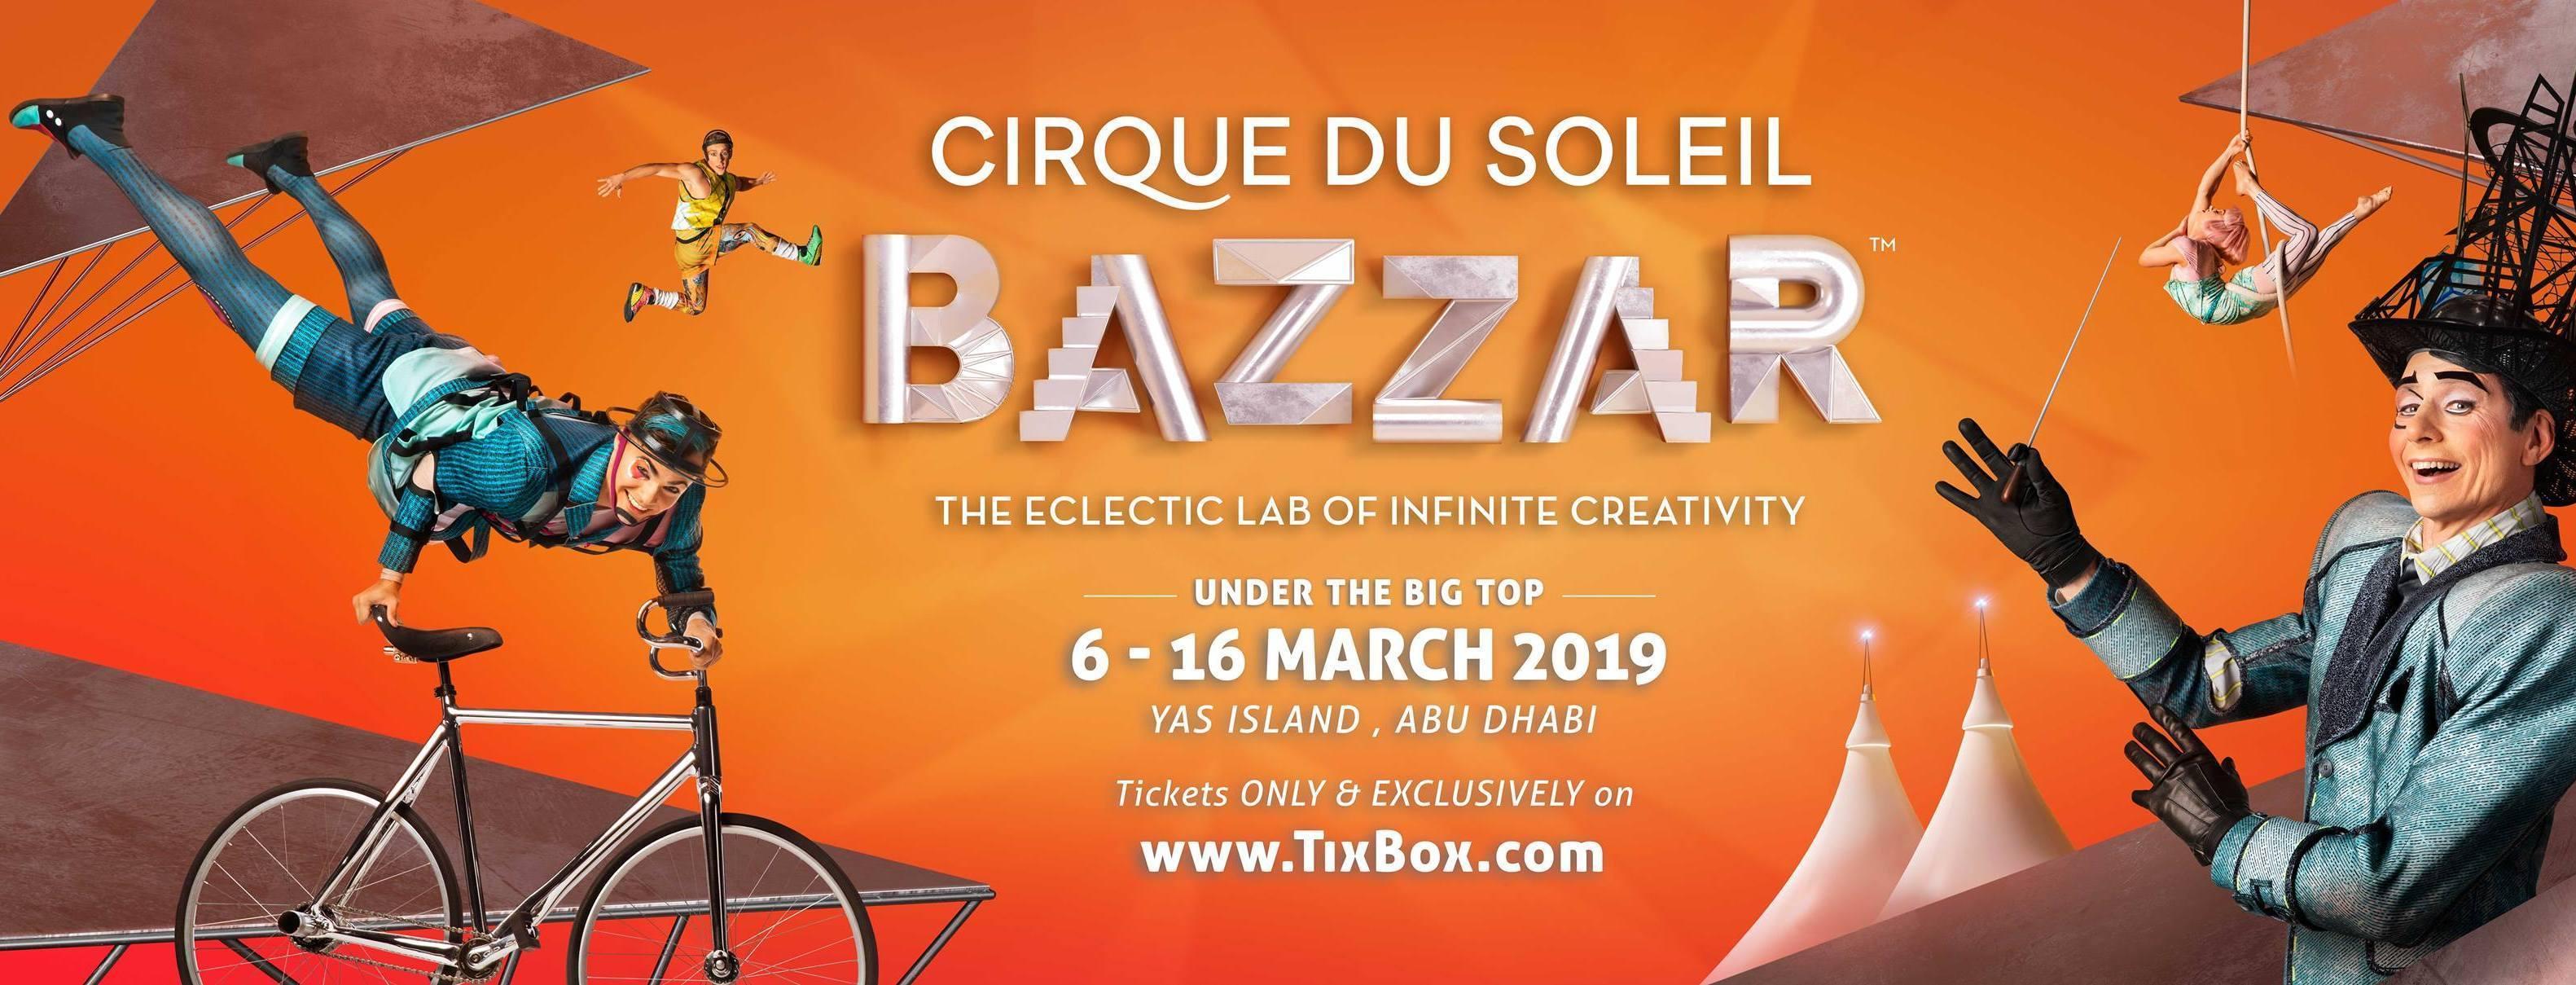 Cirque du Soleil BAZZAR at Yas Island - Coming Soon in UAE